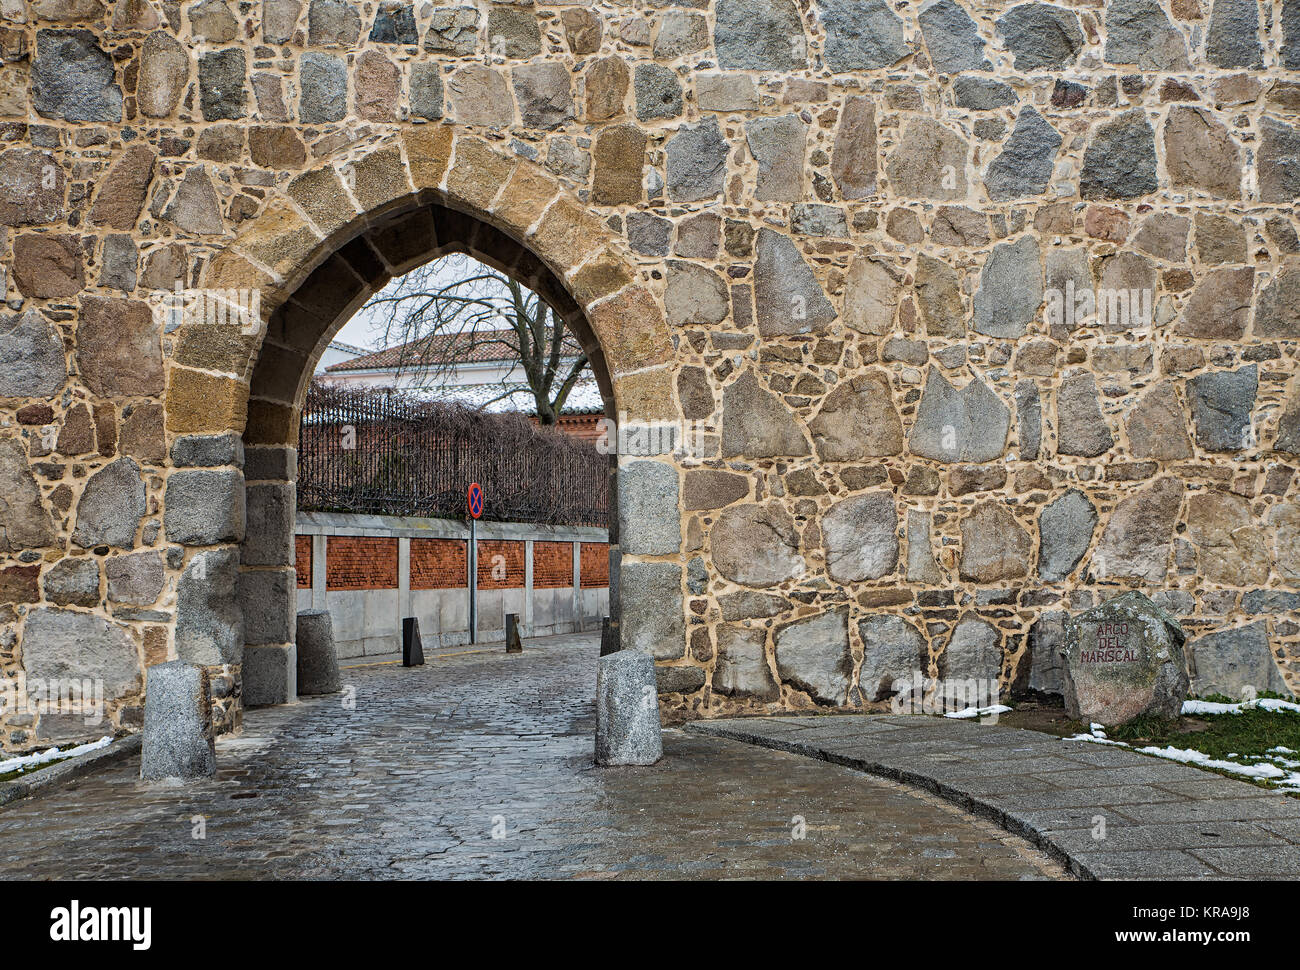 Gate in the medieval walls of Avila. Spain. - Stock Image